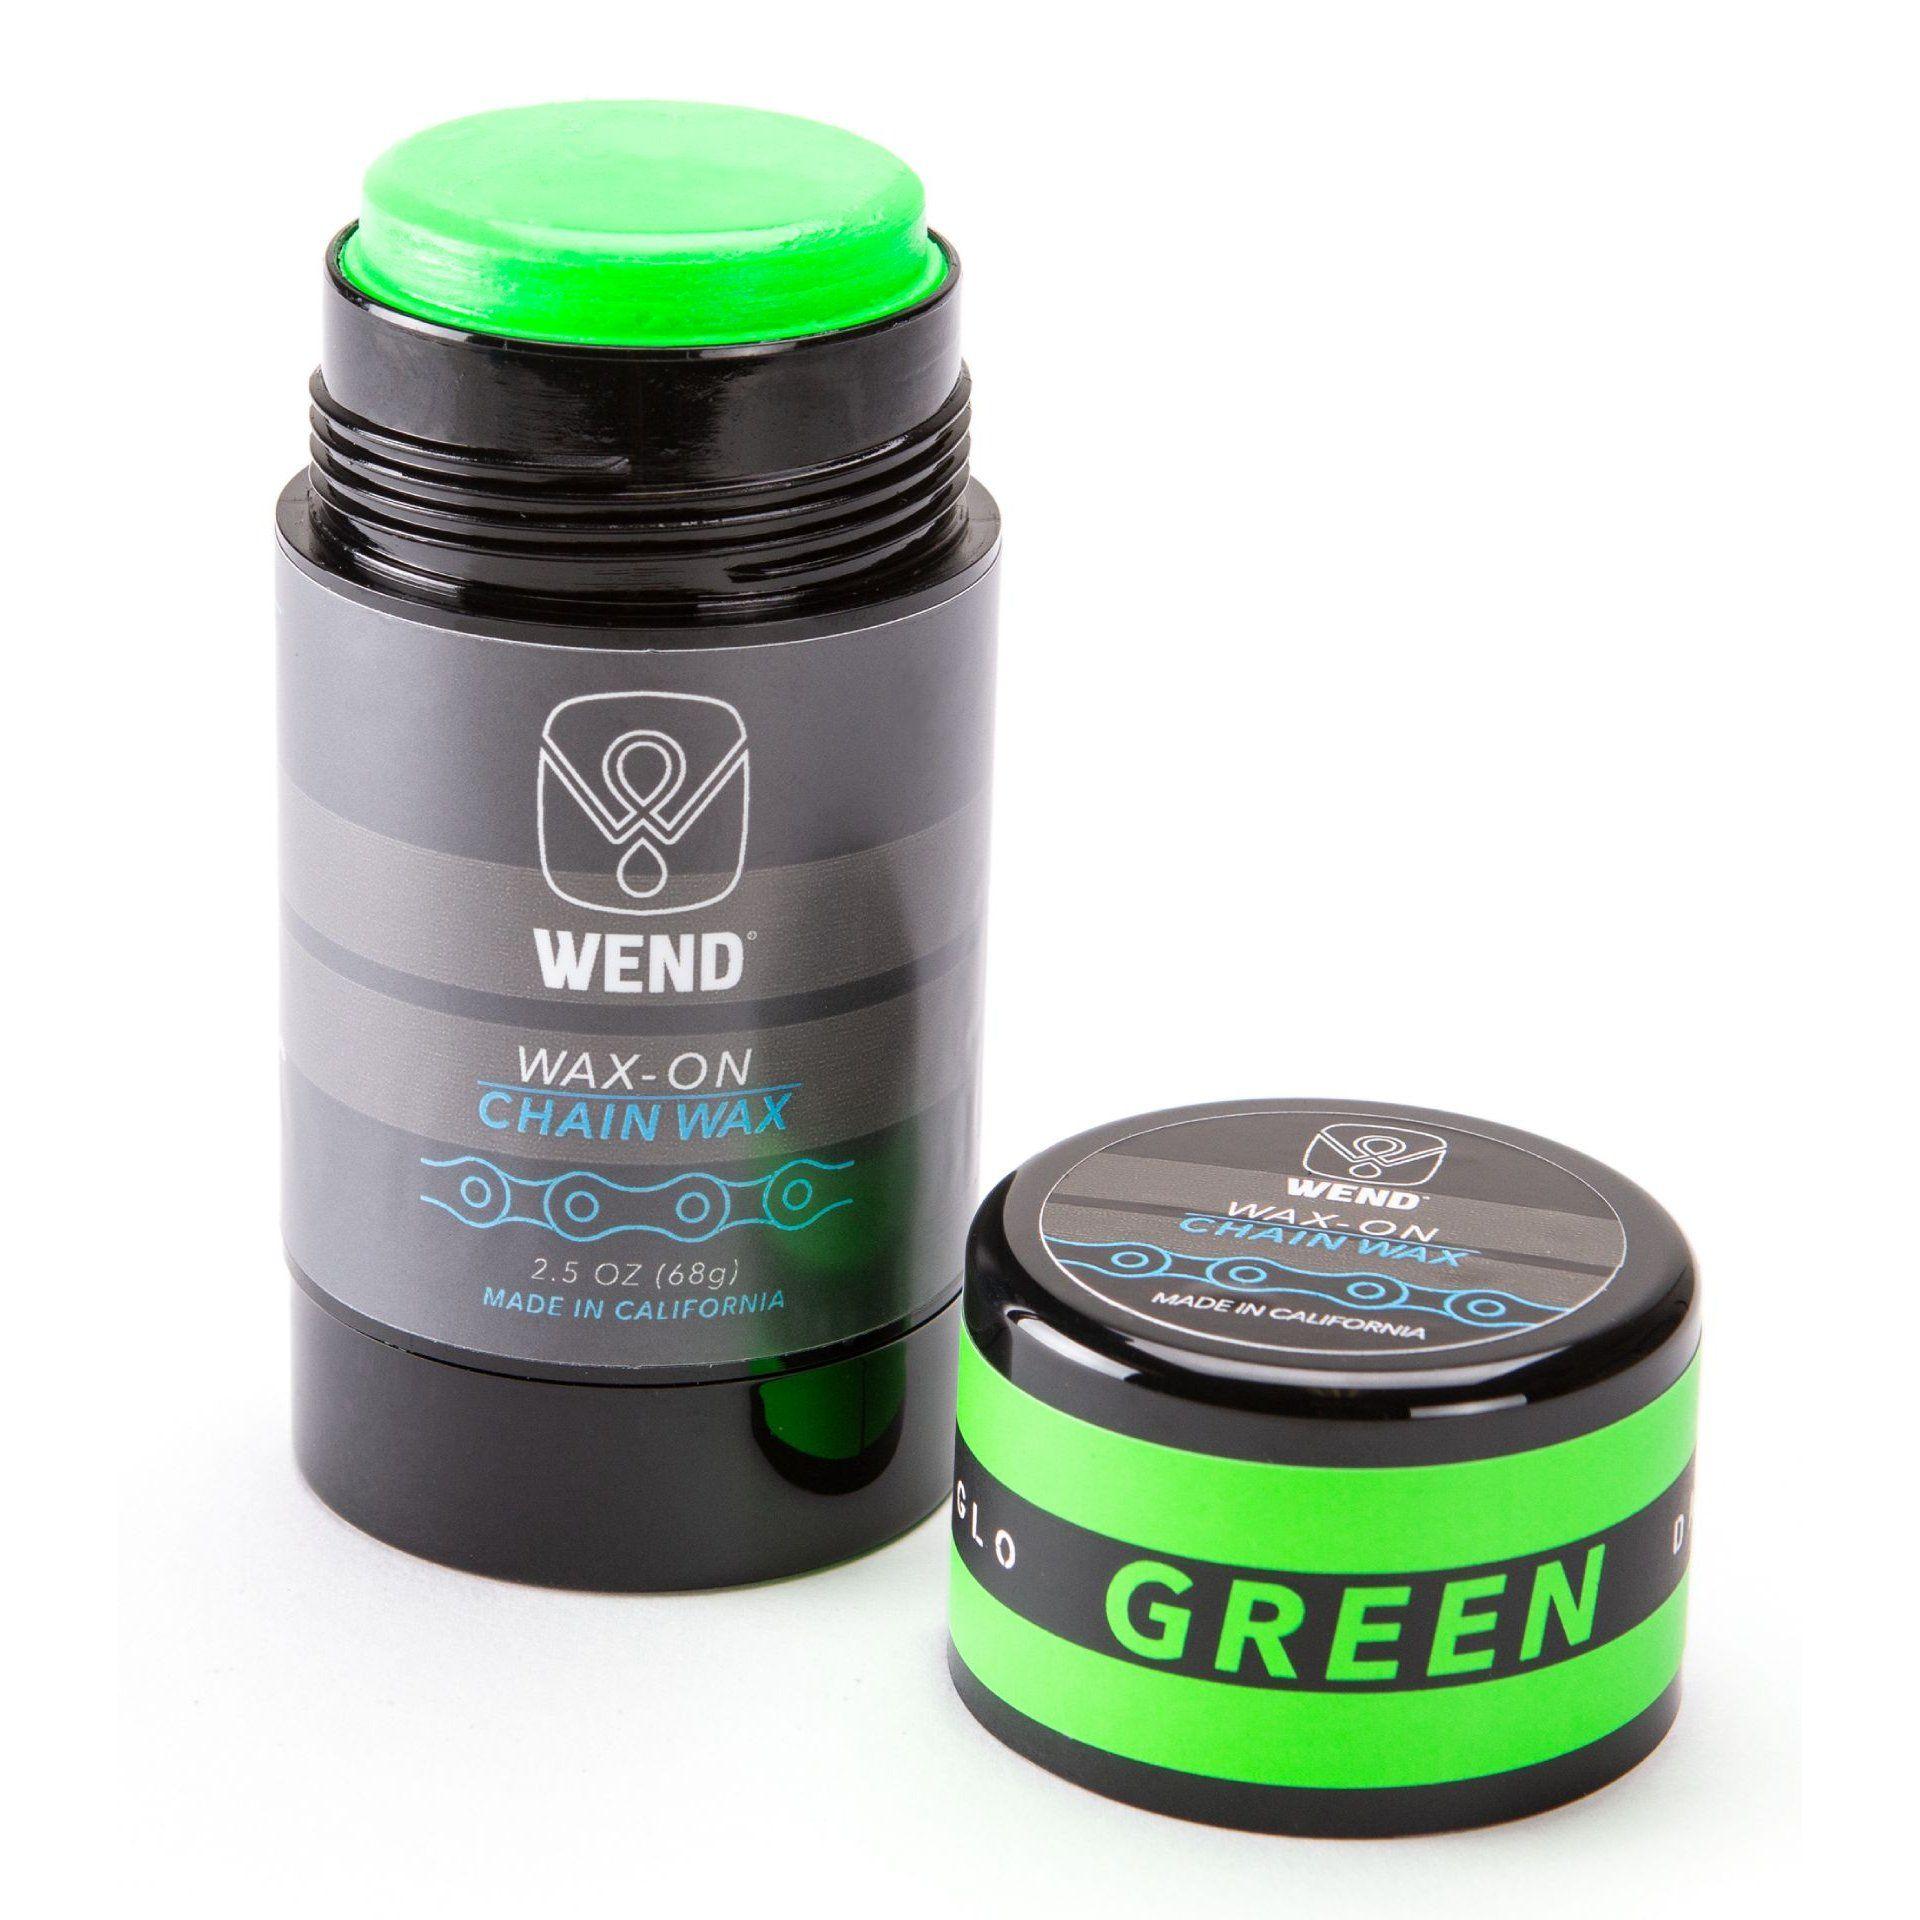 SMAR DO ŁAŃCUCHA WEND WAX ON CHAIN 75ML GREEN